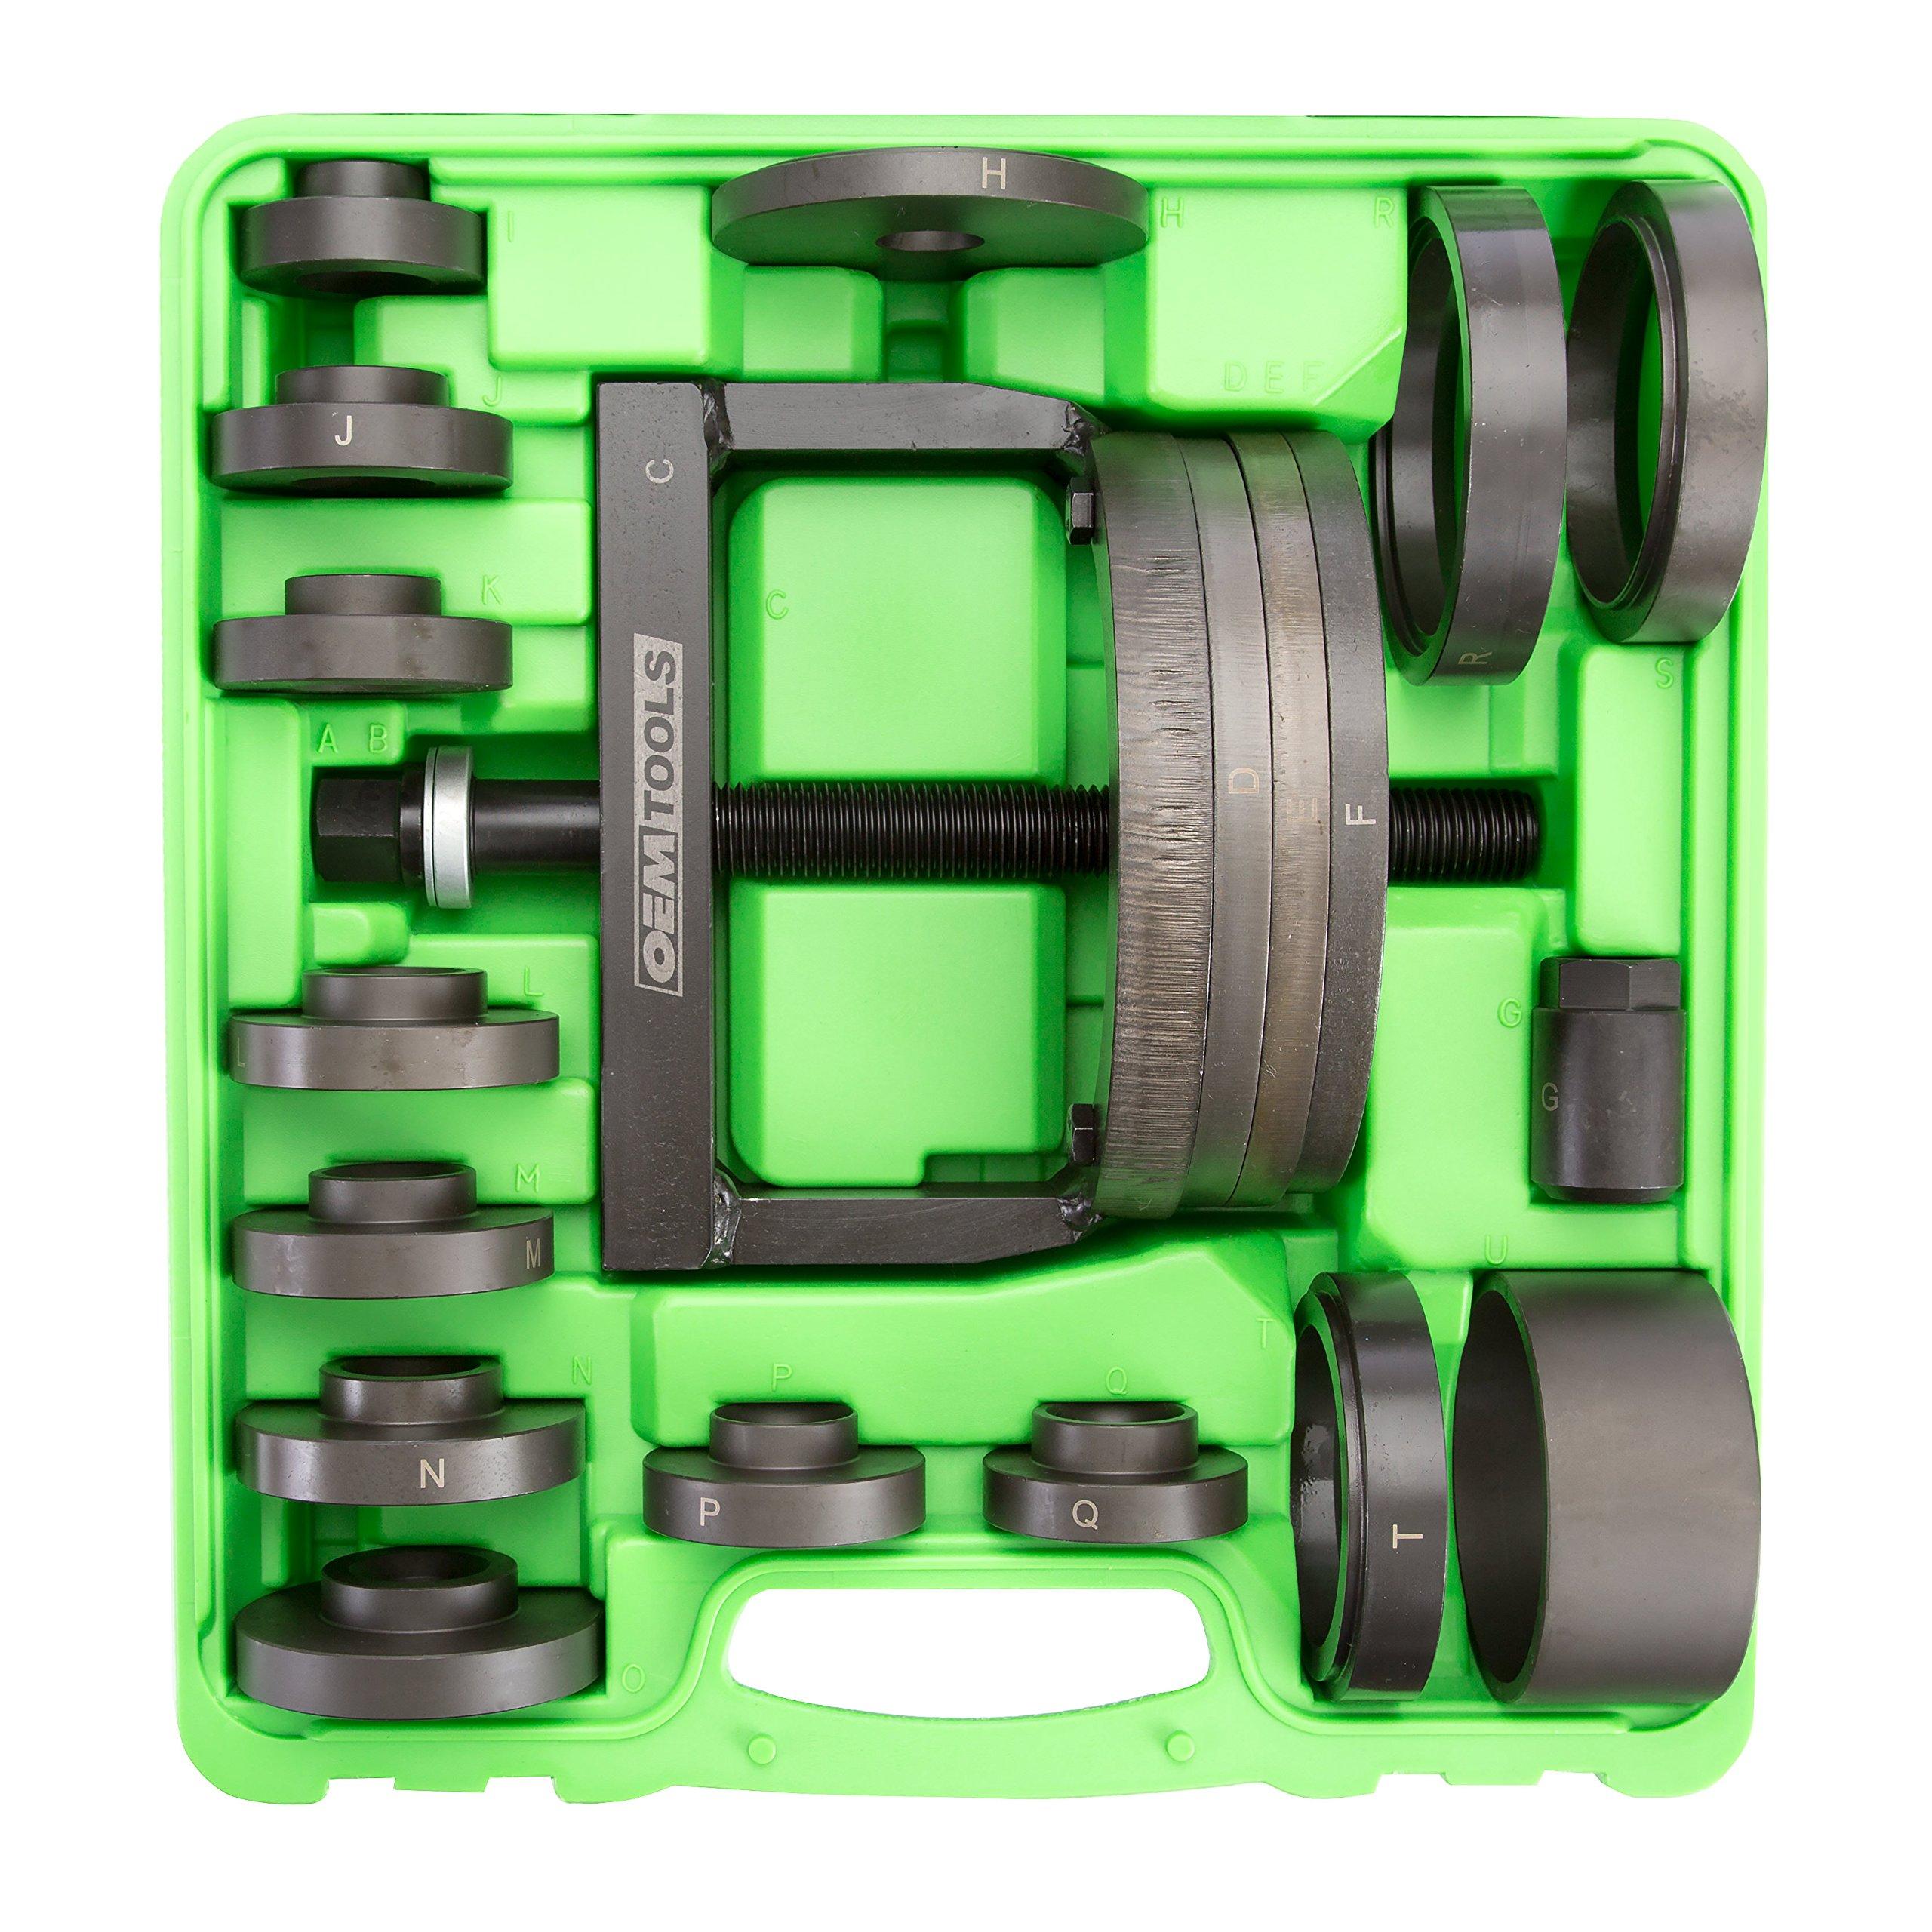 OEMTOOLS 27213 Master Wheel Hub & Bearing Remover & Installer Kit,